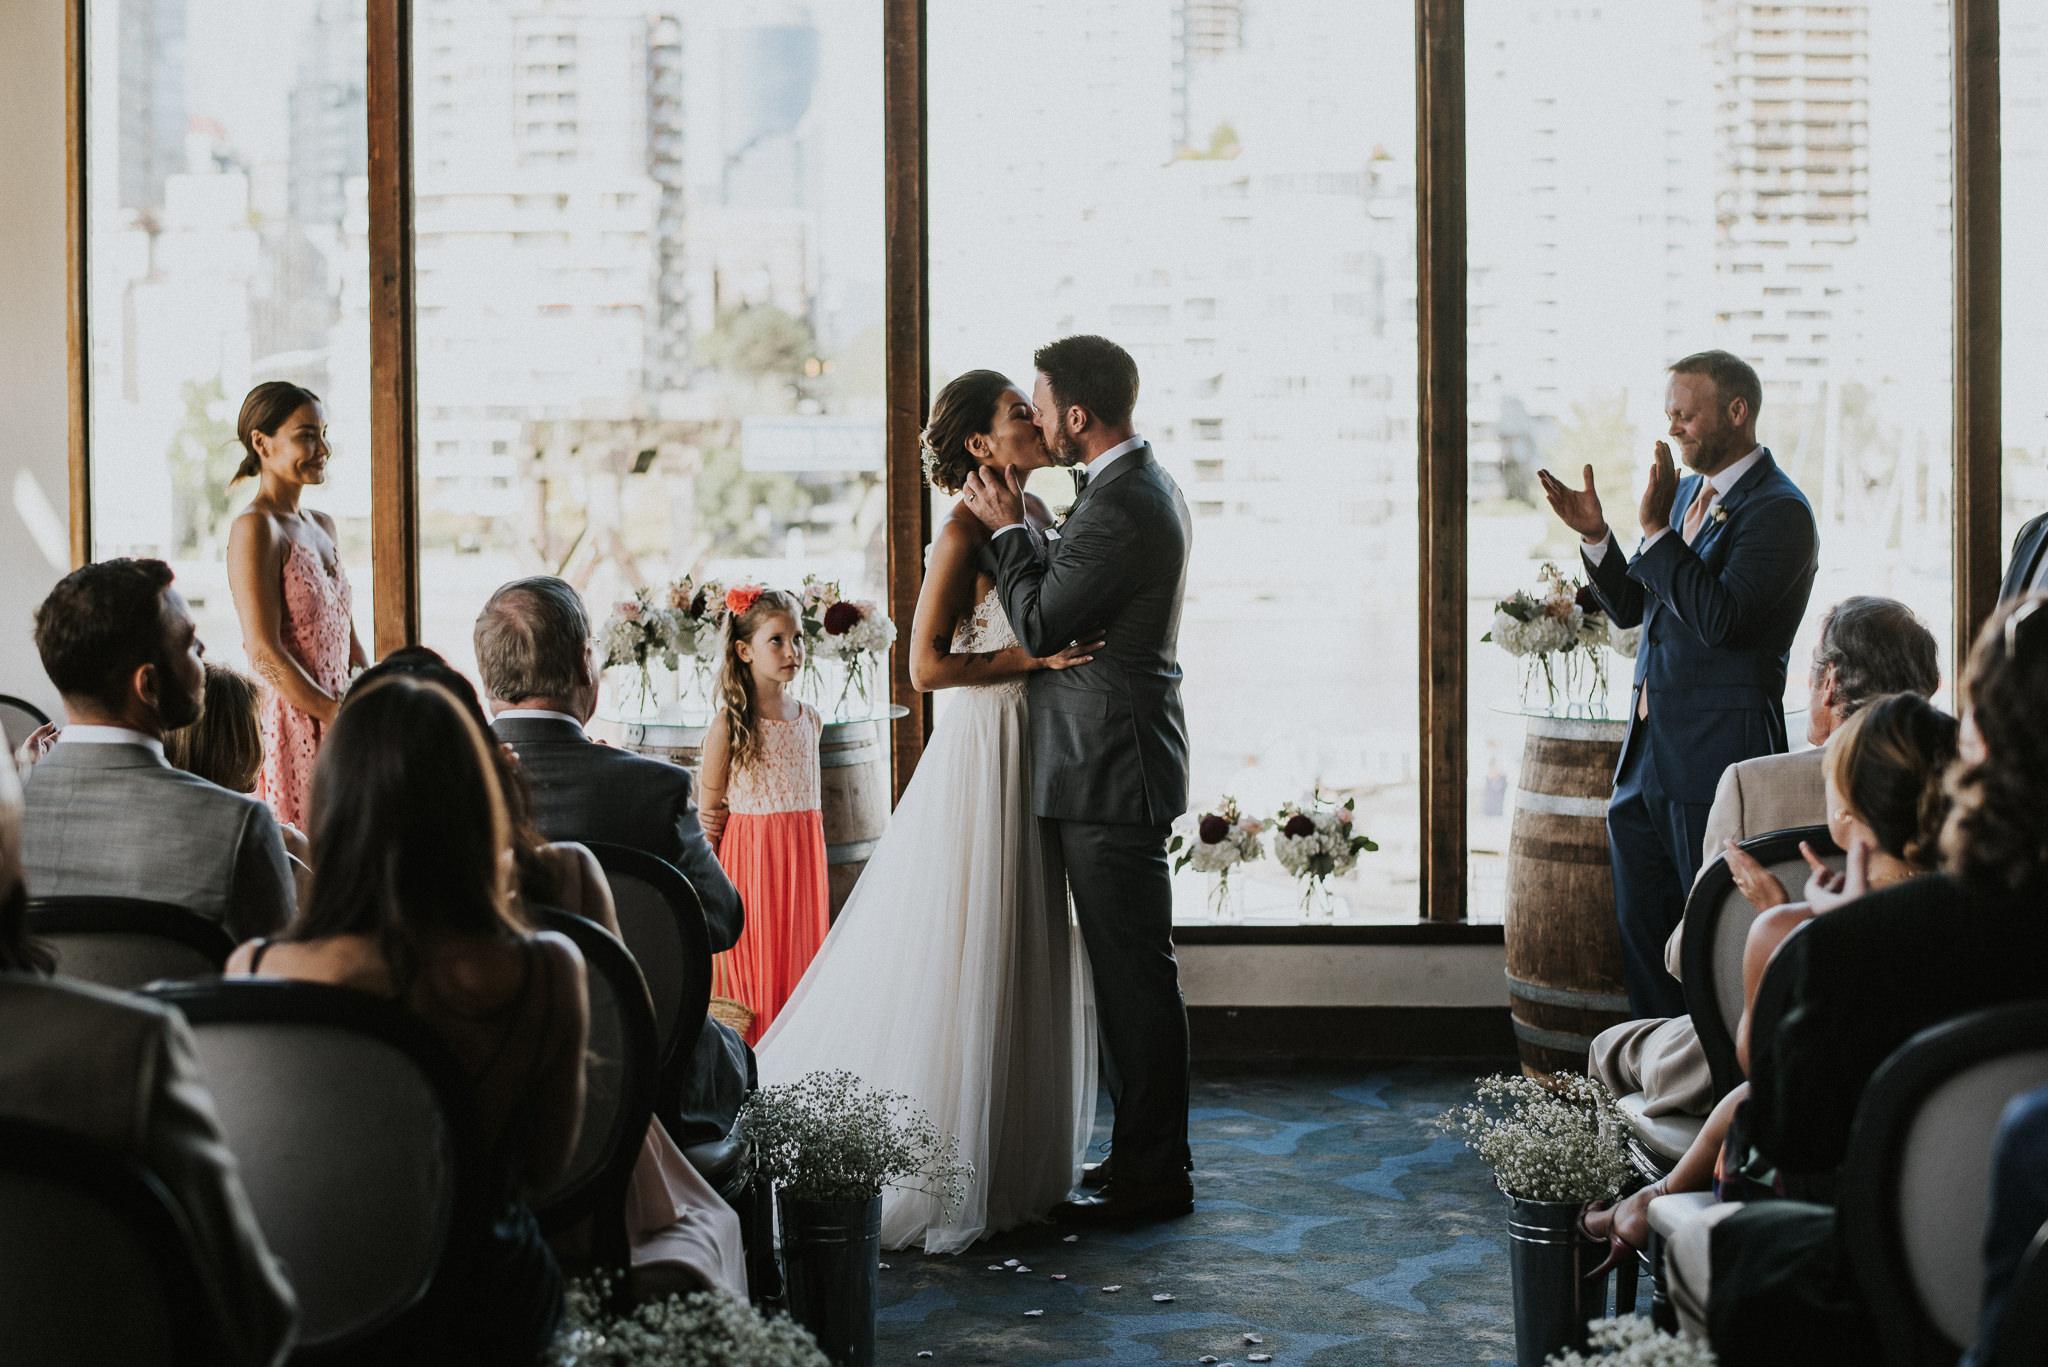 149-bridges-granville-island-vancouver-wedding-ayakopaddy-web-5991.jpg